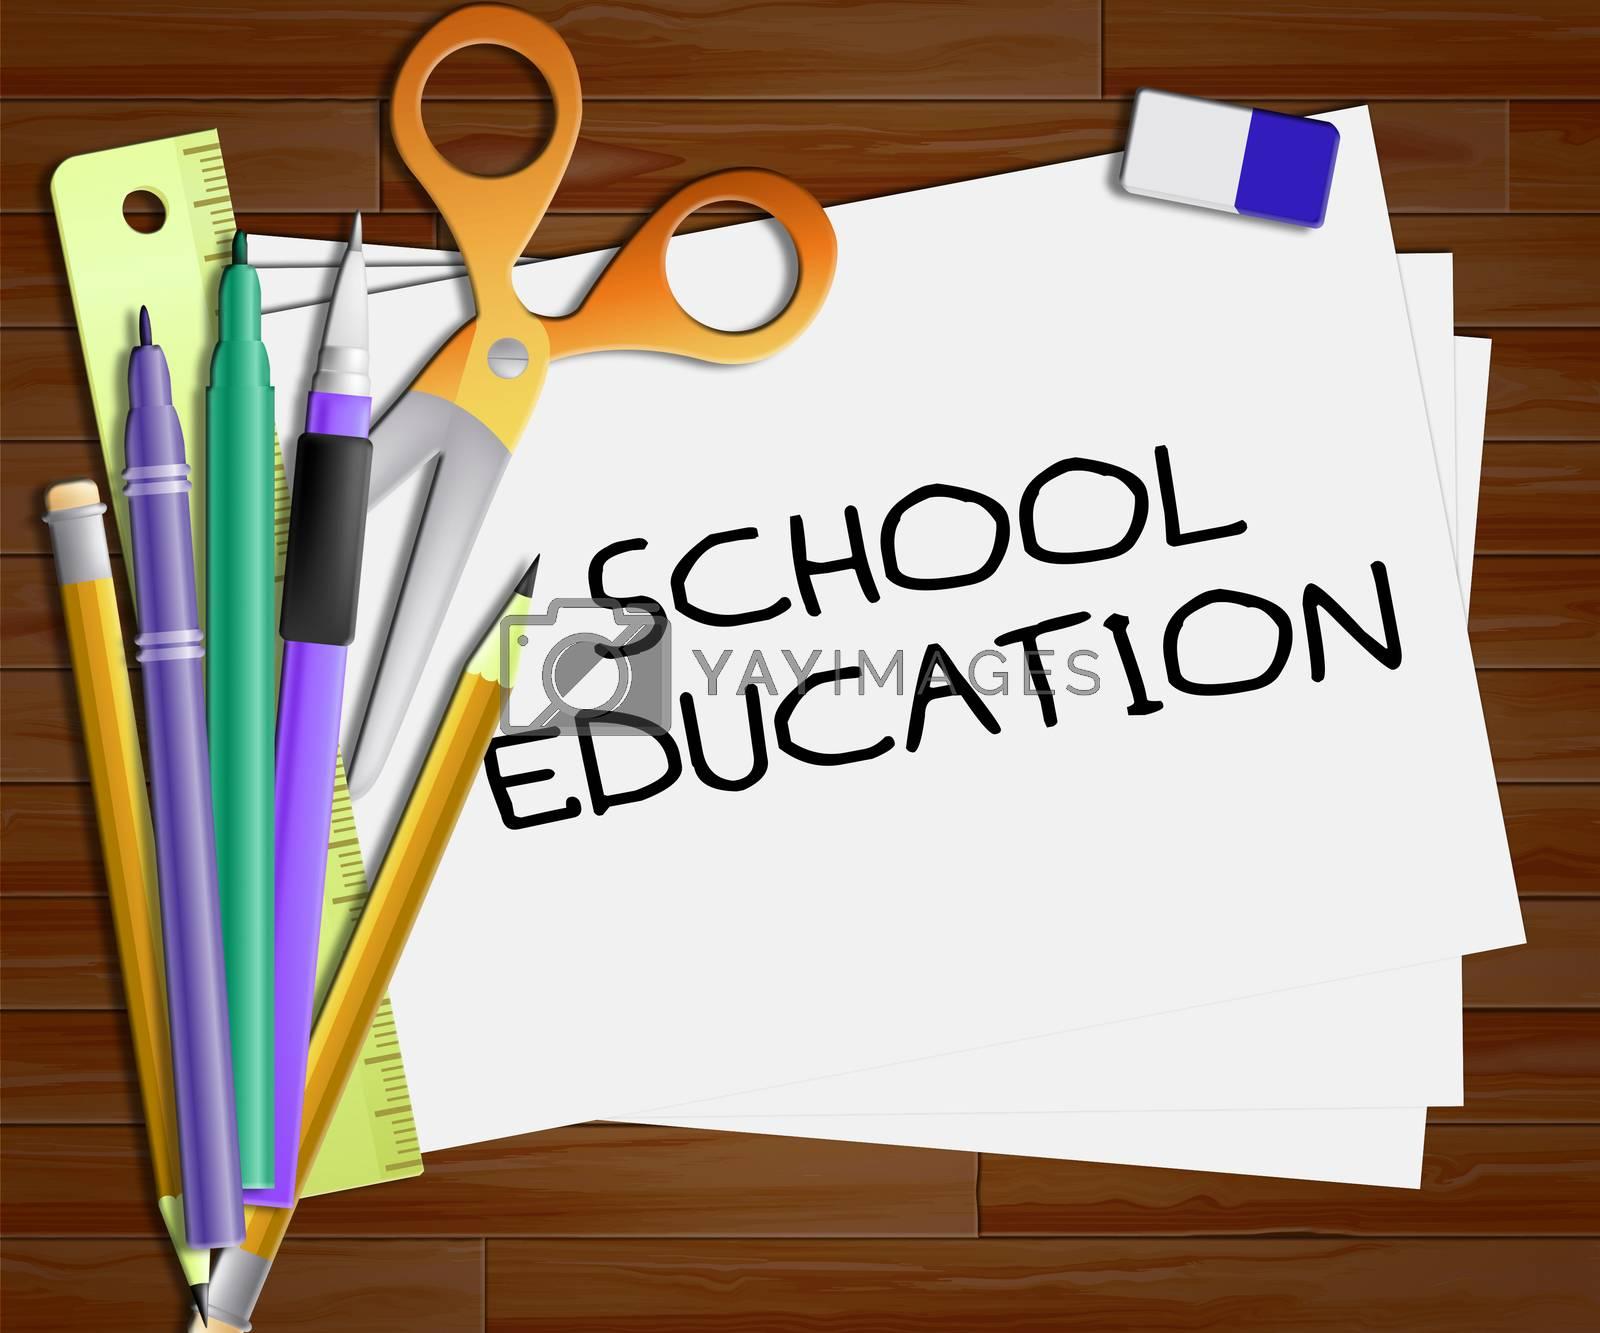 School Education Showing Kids Education 3d Illustration